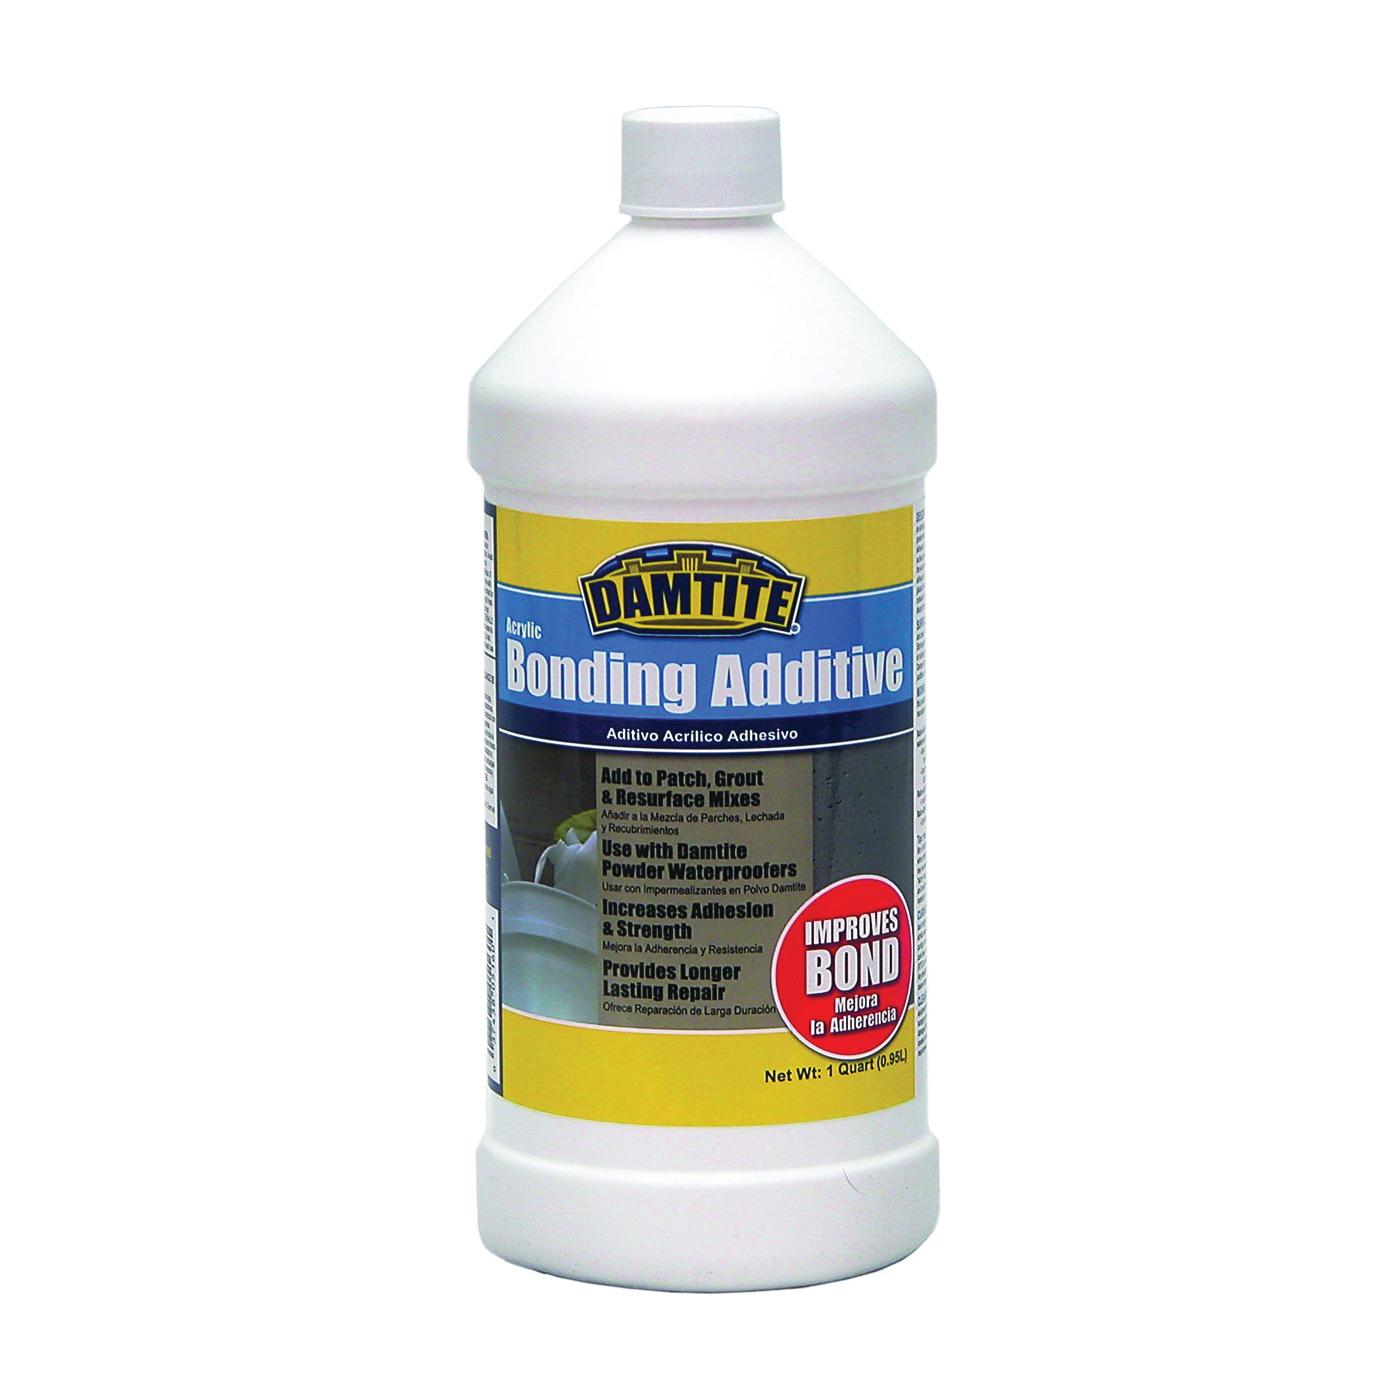 Picture of DAMTITE 05160 Bonding Additive, Liquid, Ammonia, White, 1 qt Package, Bottle